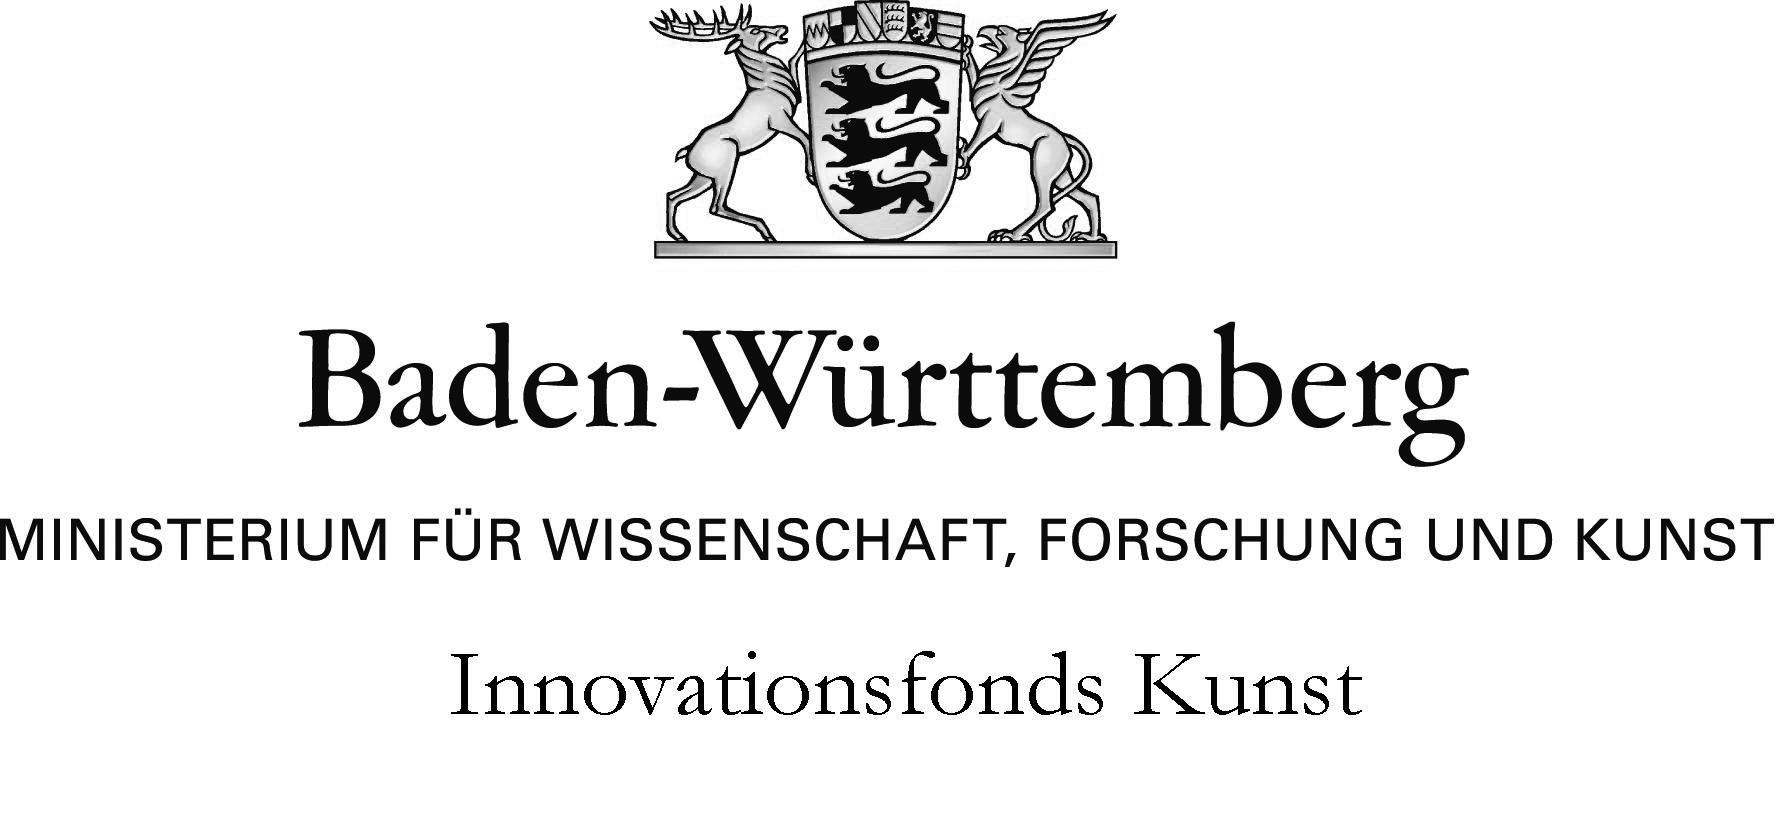 logo_bawue_innovationsfond_sw.jpg